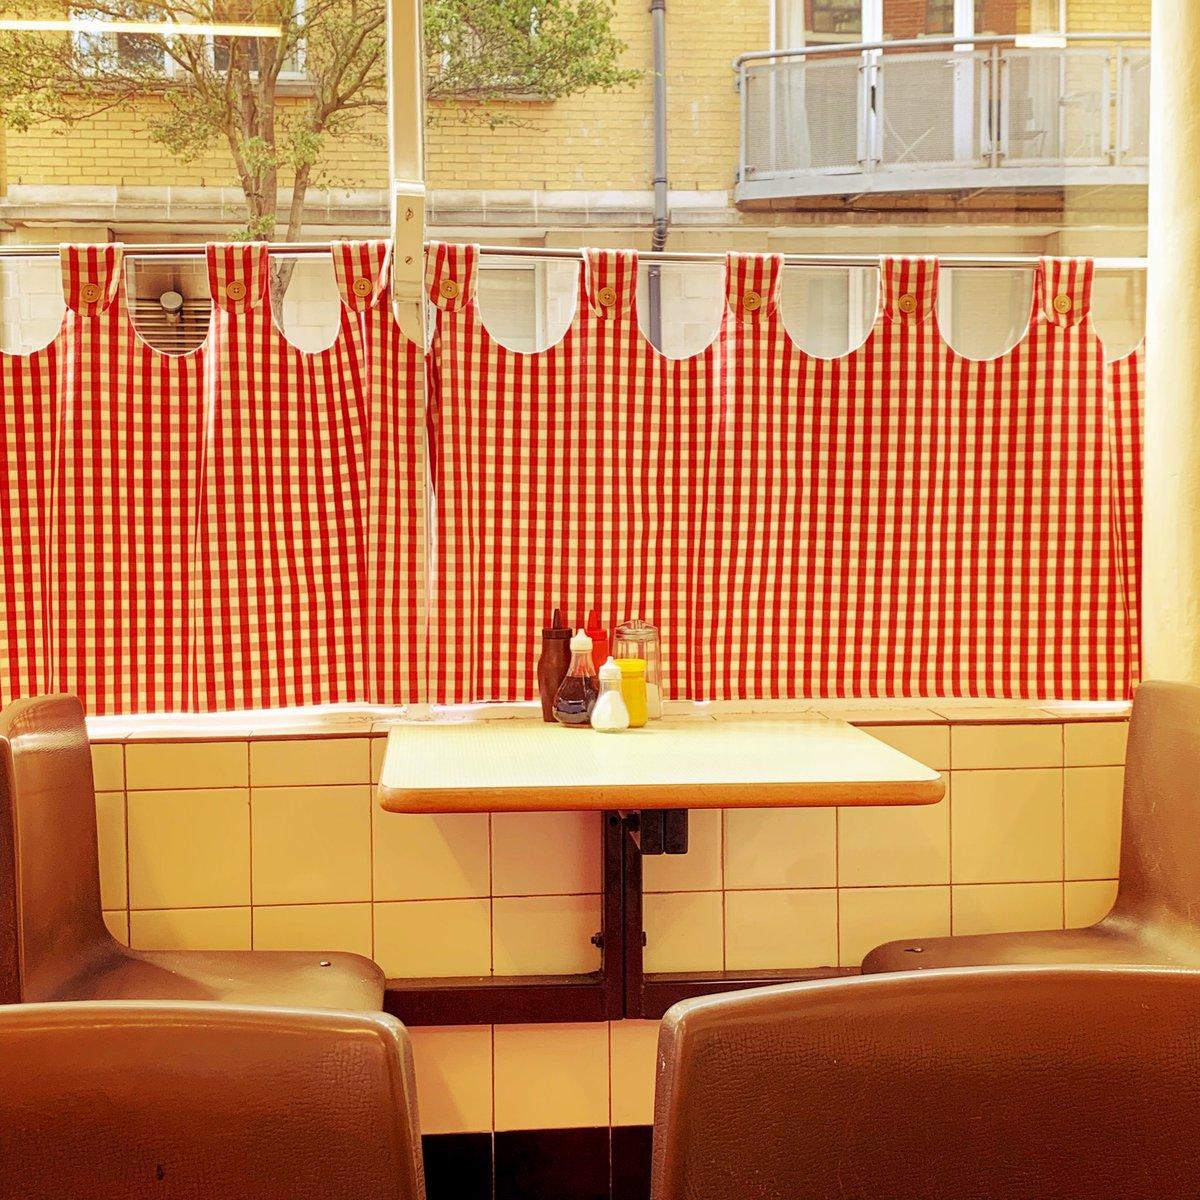 The one and only Regency Cafe regencycafelondon.com #londonlife